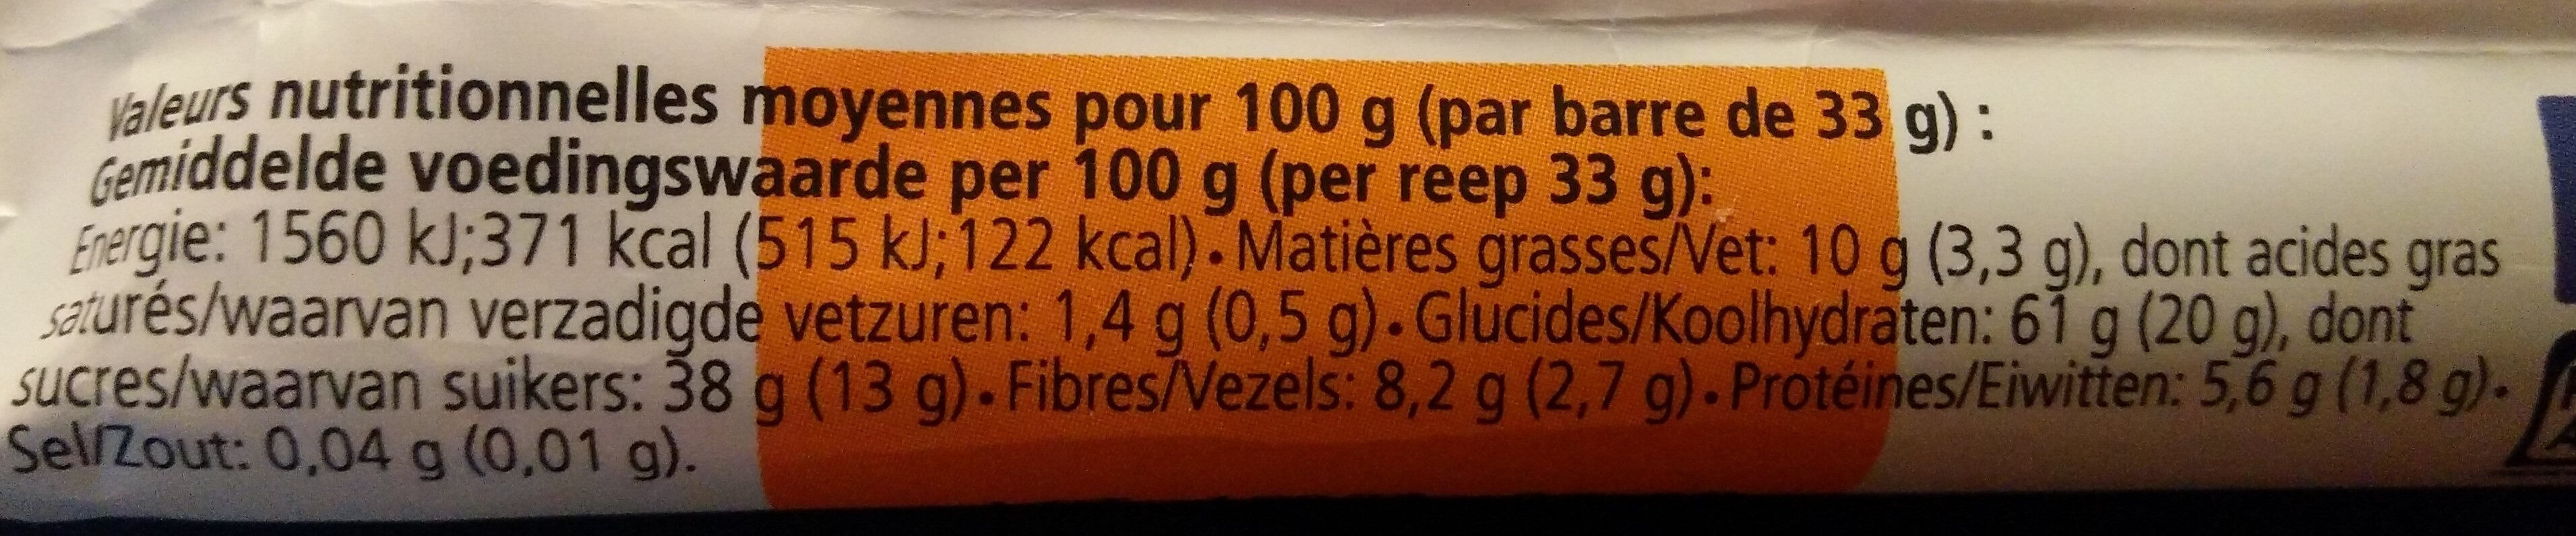 Barre bio My Super Food Veggie Abricot Figue - Informations nutritionnelles